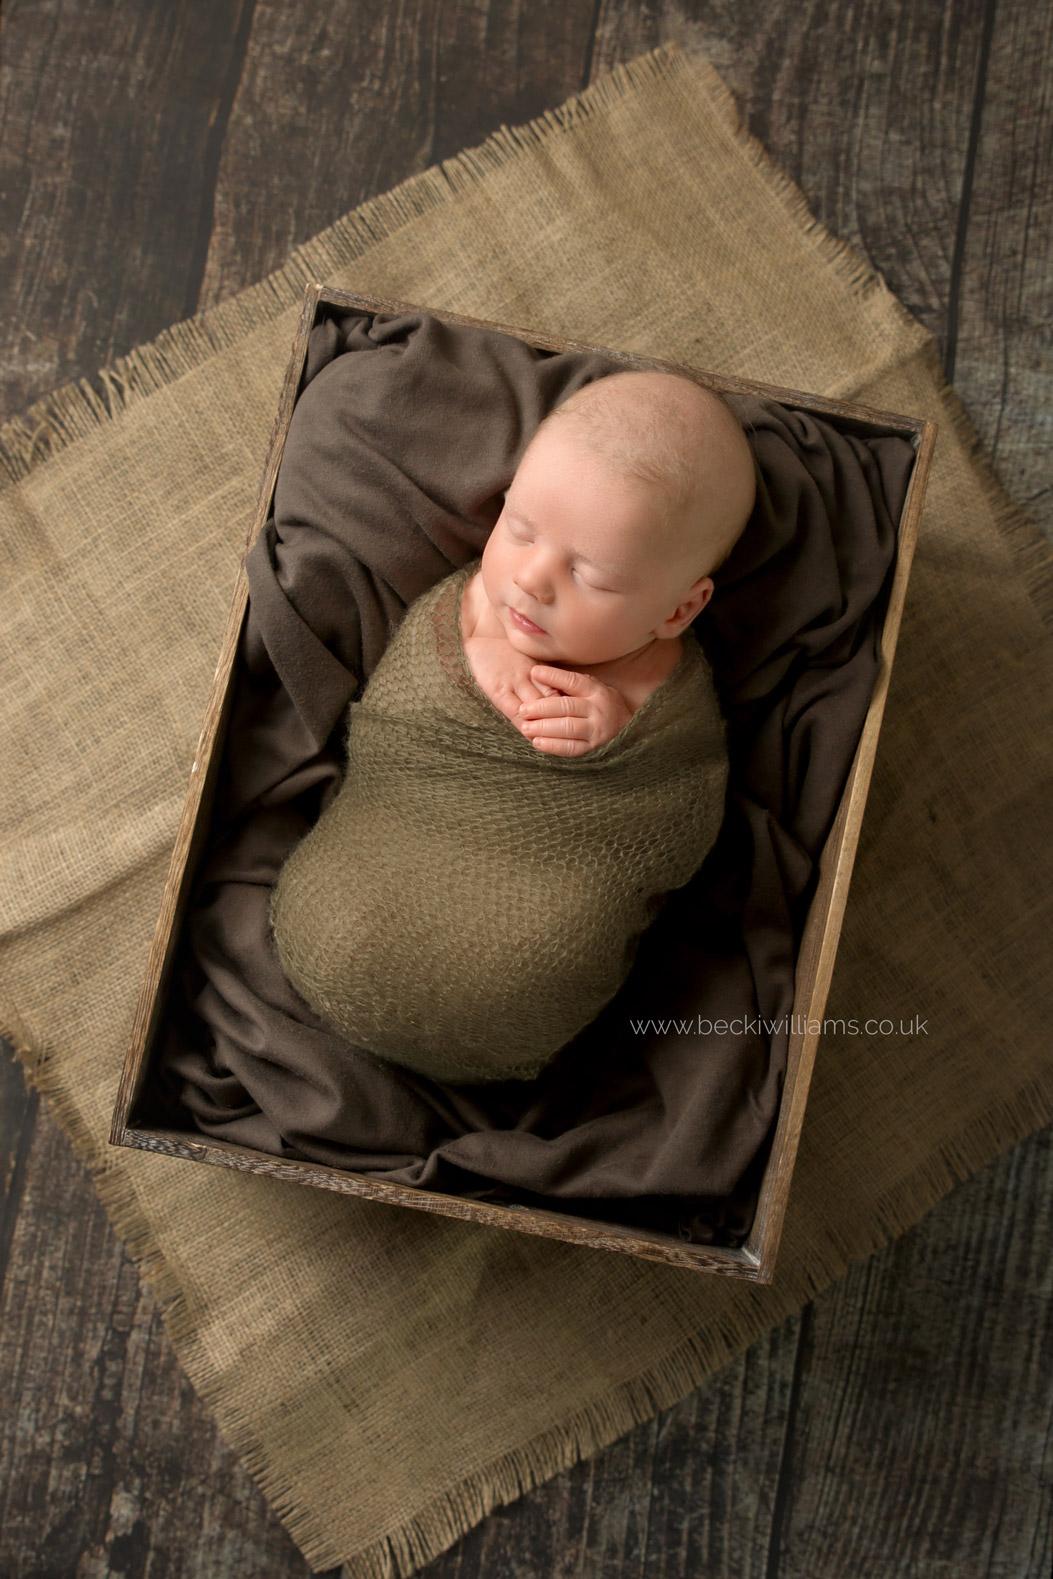 newborn-photography-hemel-hempstead-crate-brown-wrapped-sleeping.jpg